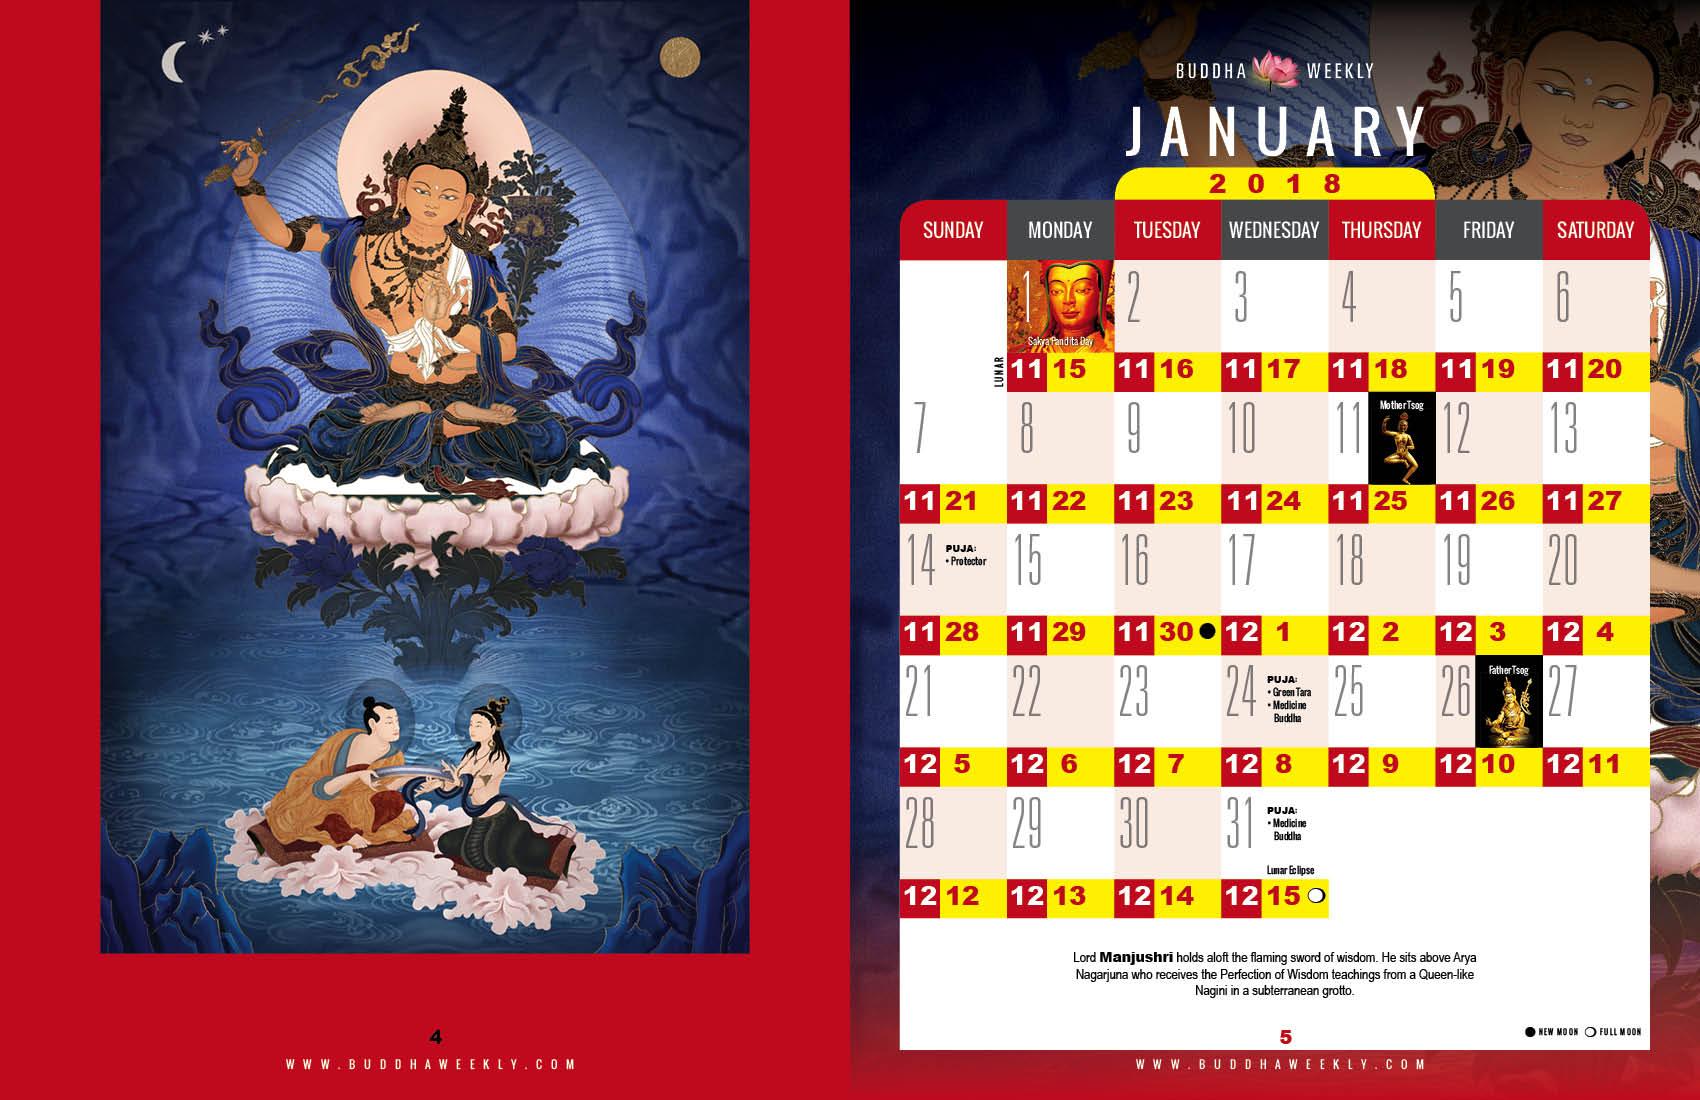 Lunar Calendar 2018 12 Buddha Weekly 1 January low